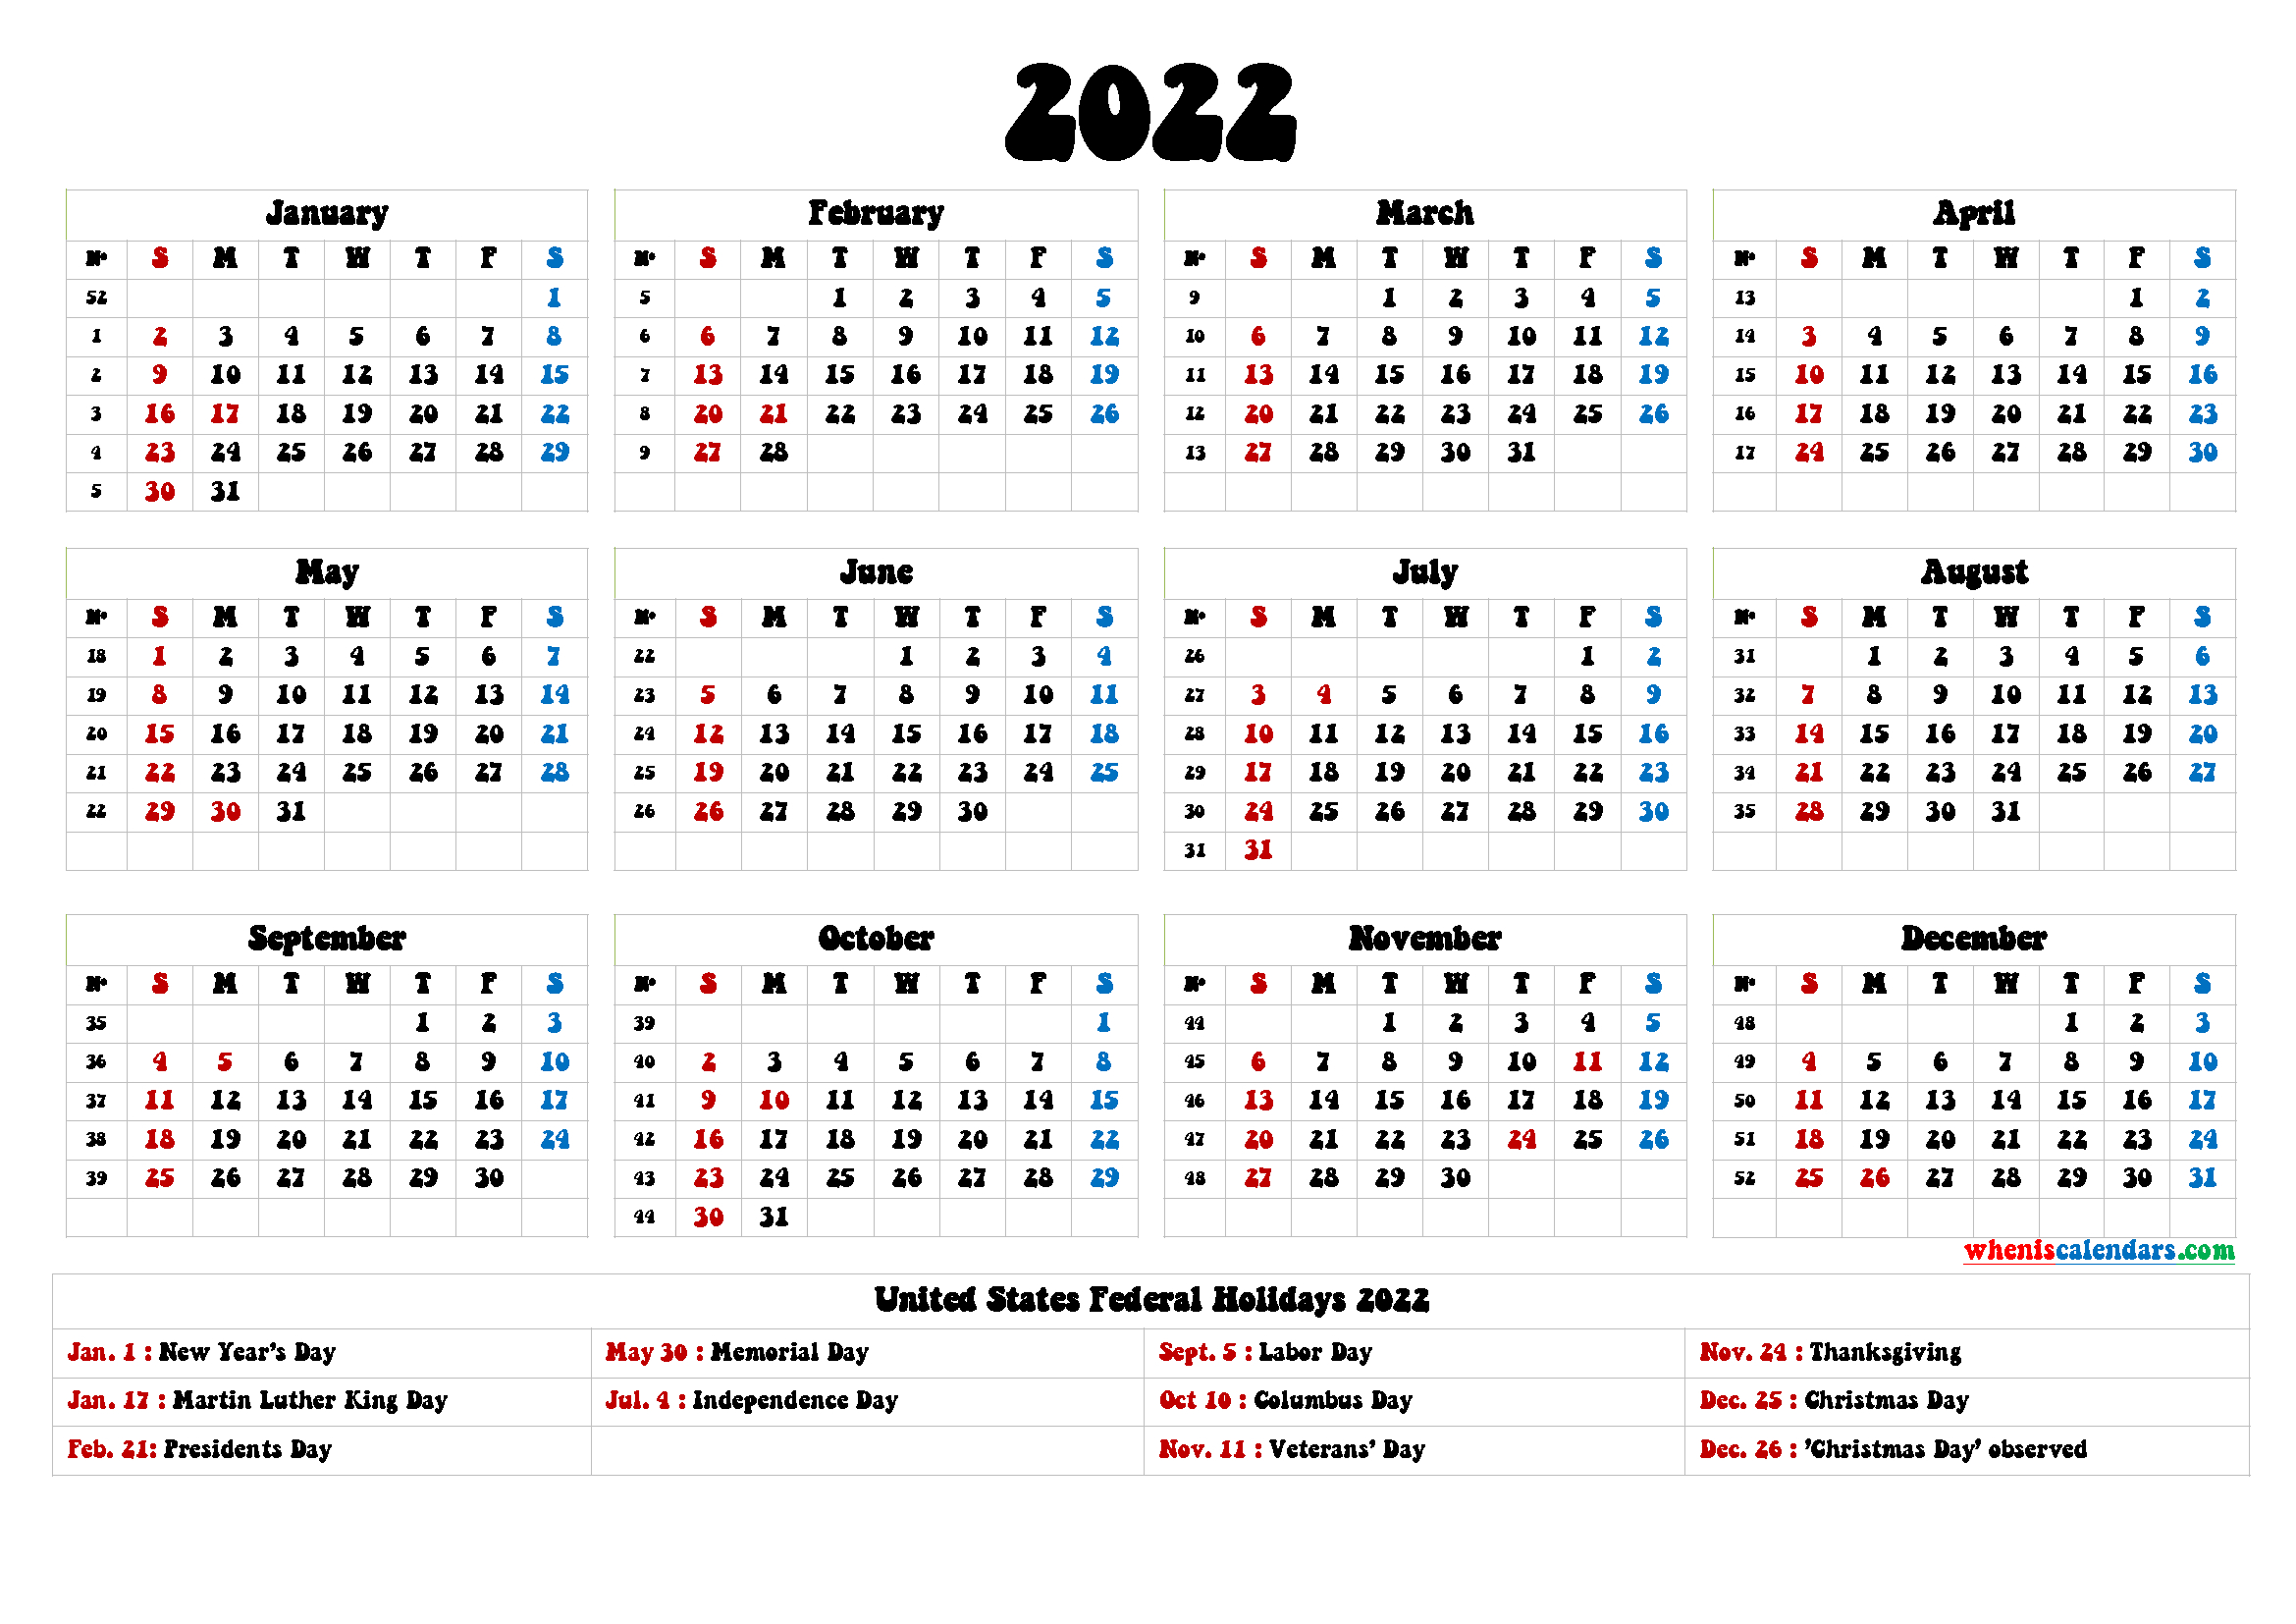 20+ Federal Holidays 2022 - Free Download Printable Calendar Templates ️ with 2022 Printable Julian Date Calendar